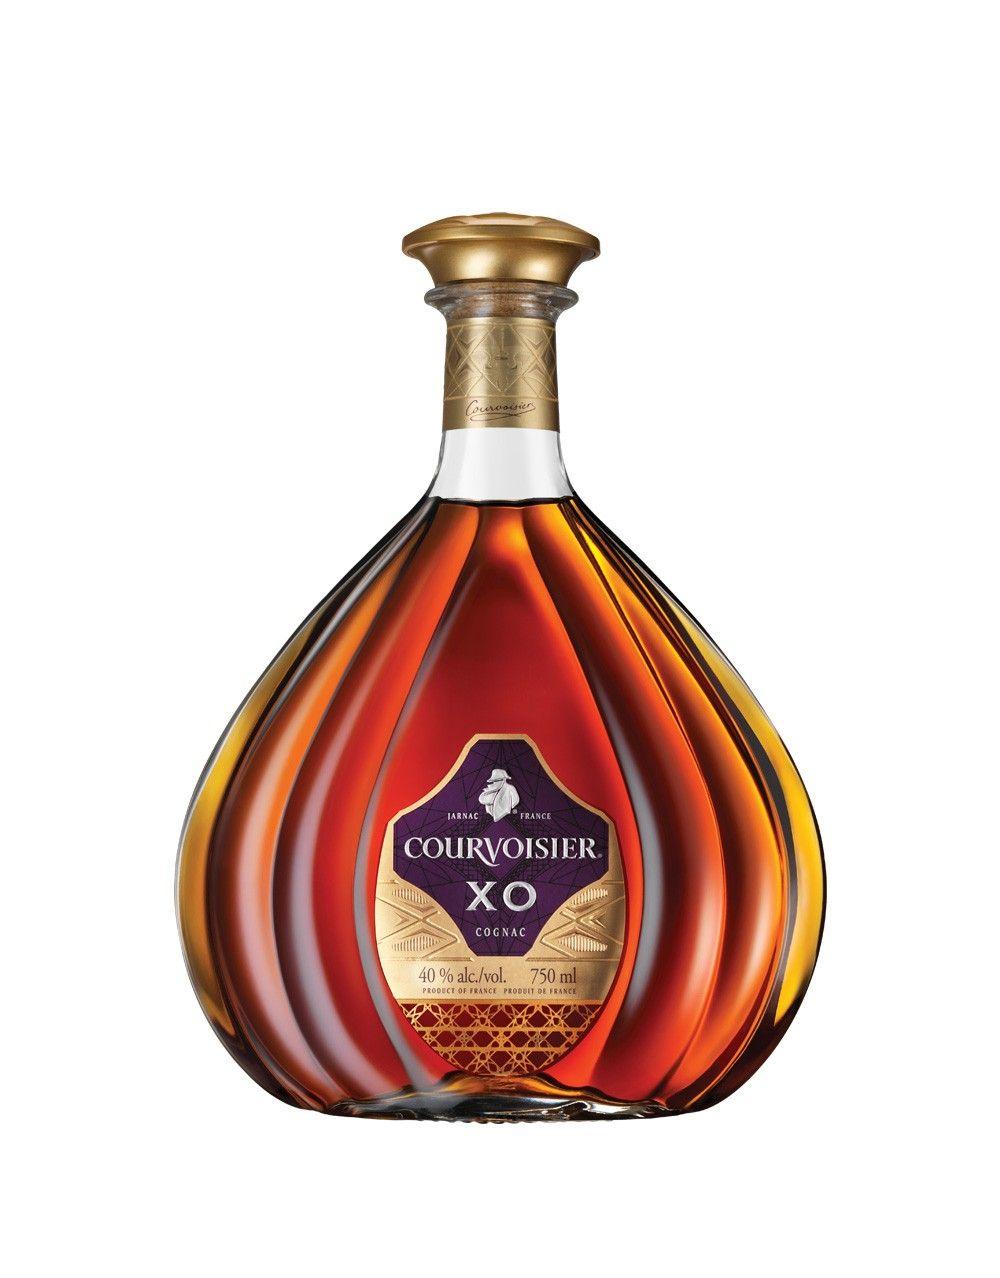 Courvoisier XO Cognac  Buy Online or Send as a Gift  ReserveBar